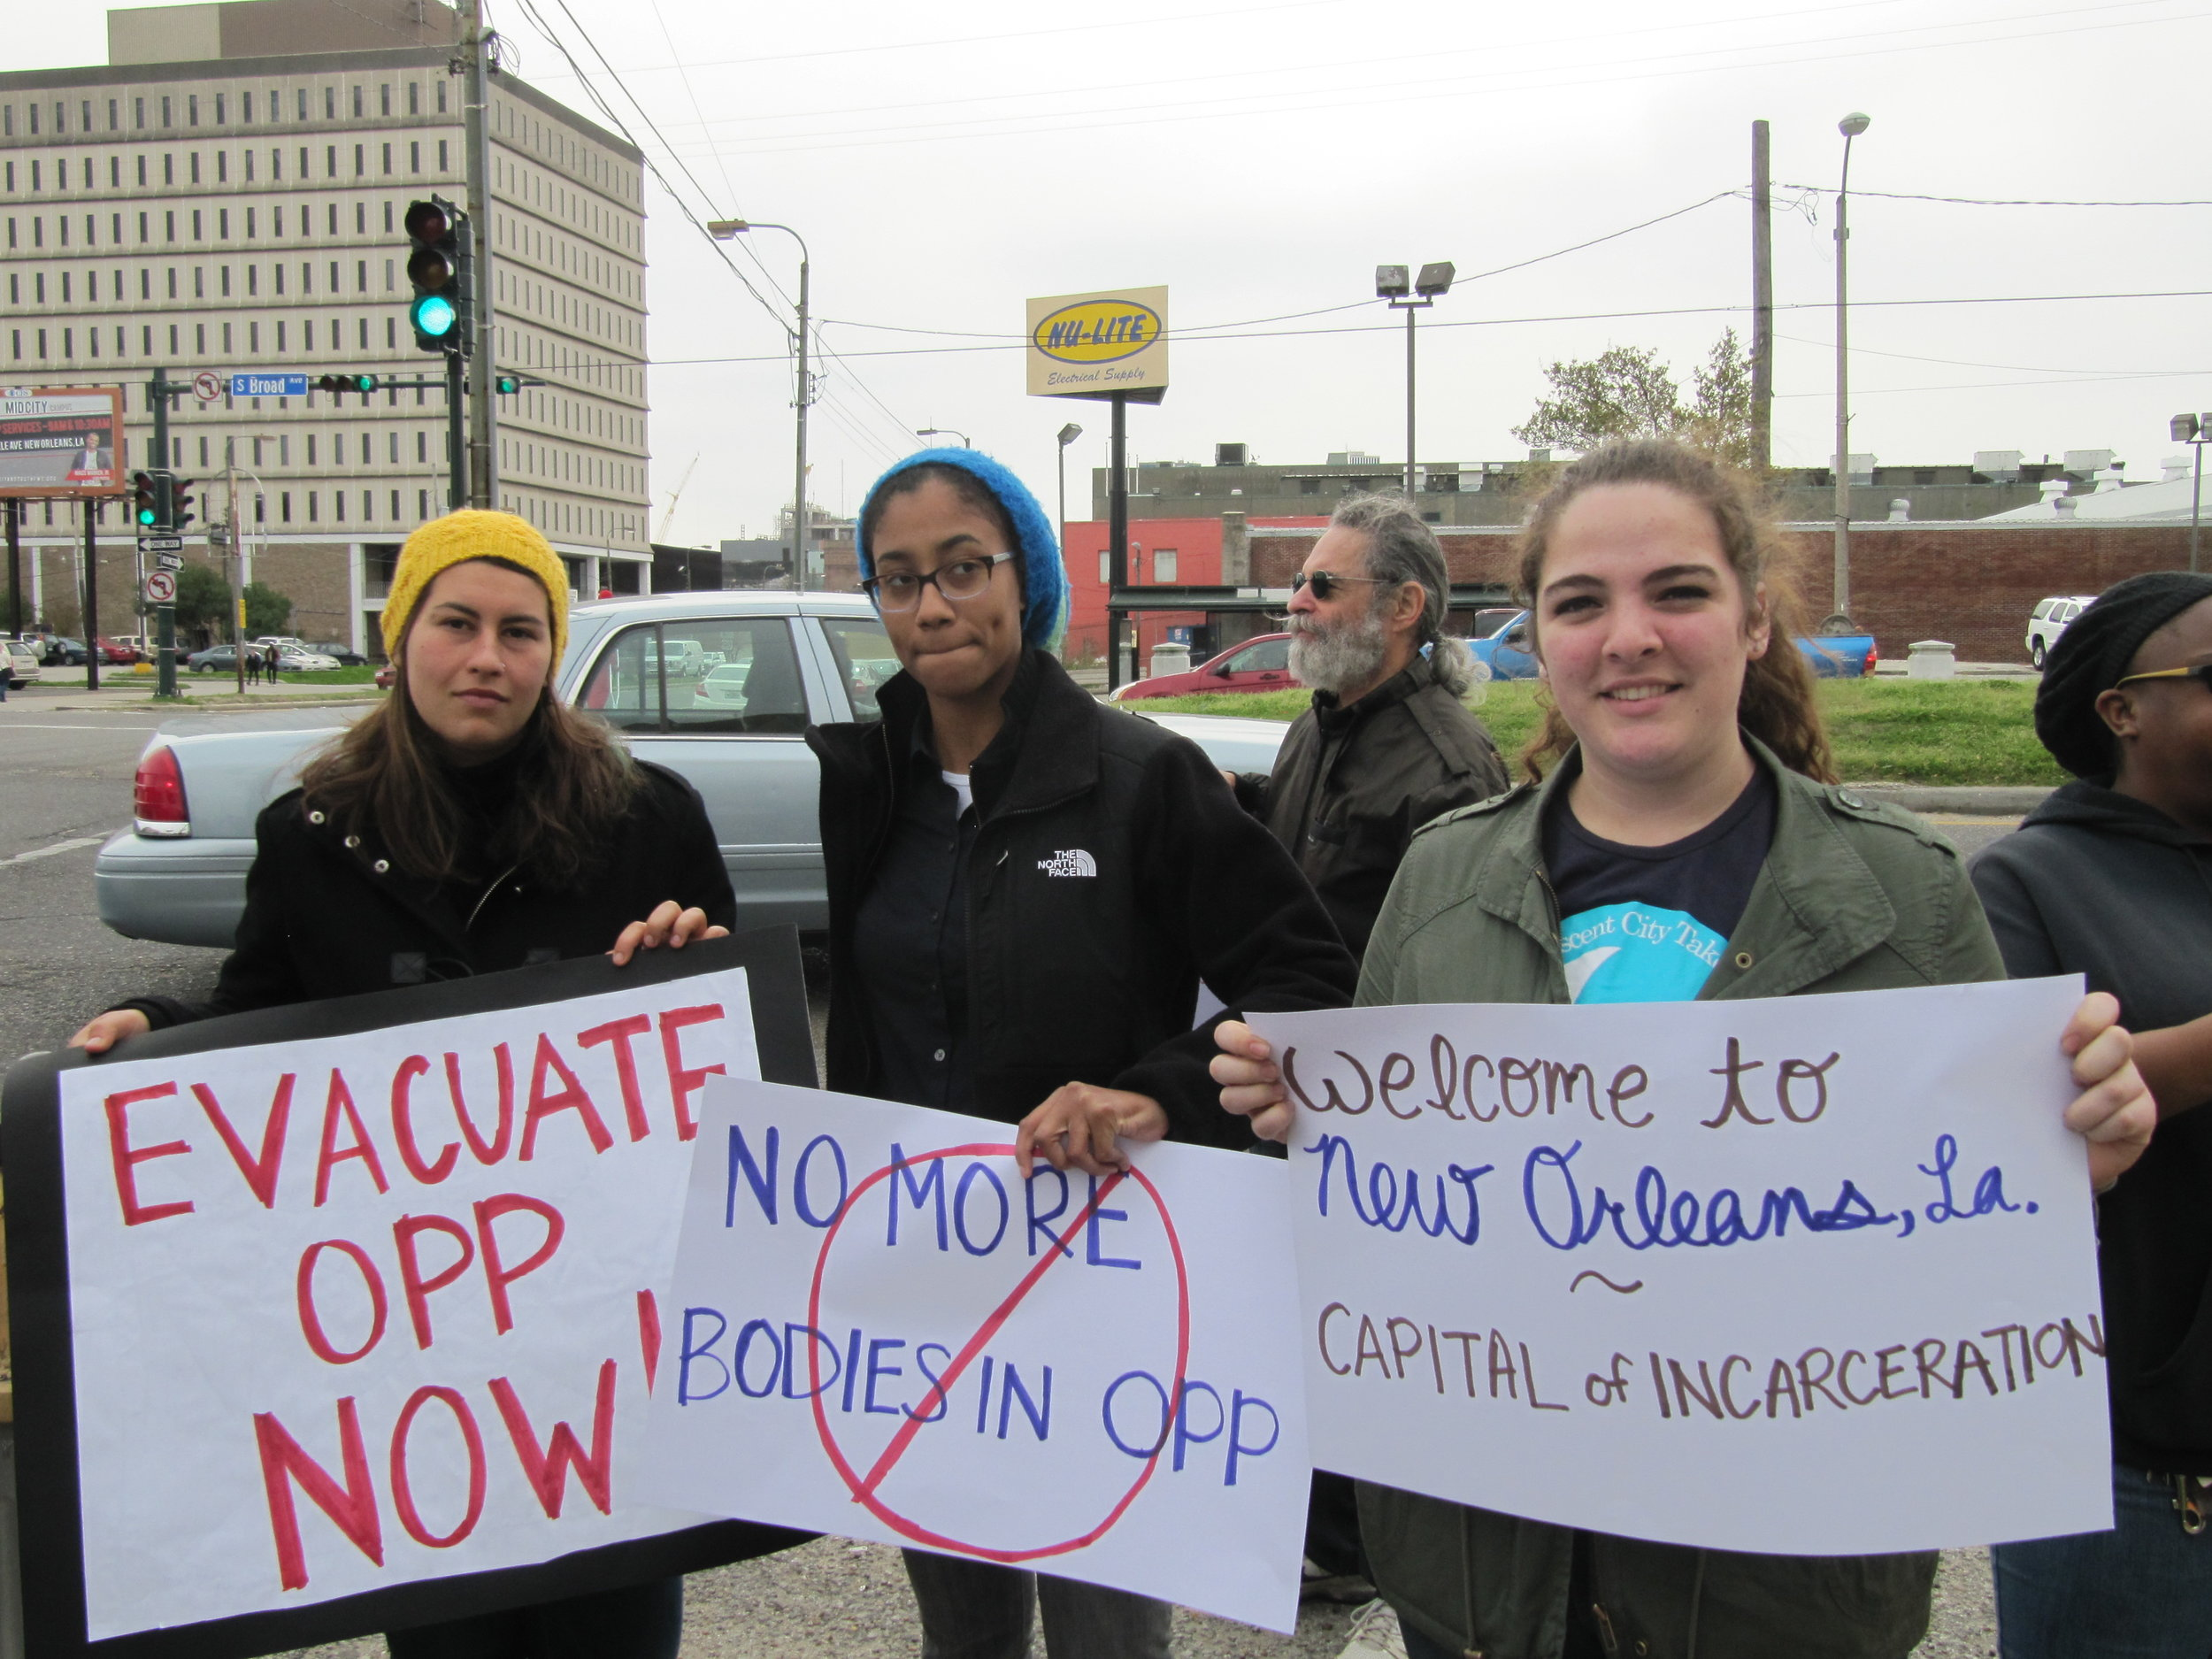 opprc-protest-3-26-14-064-copy.jpg